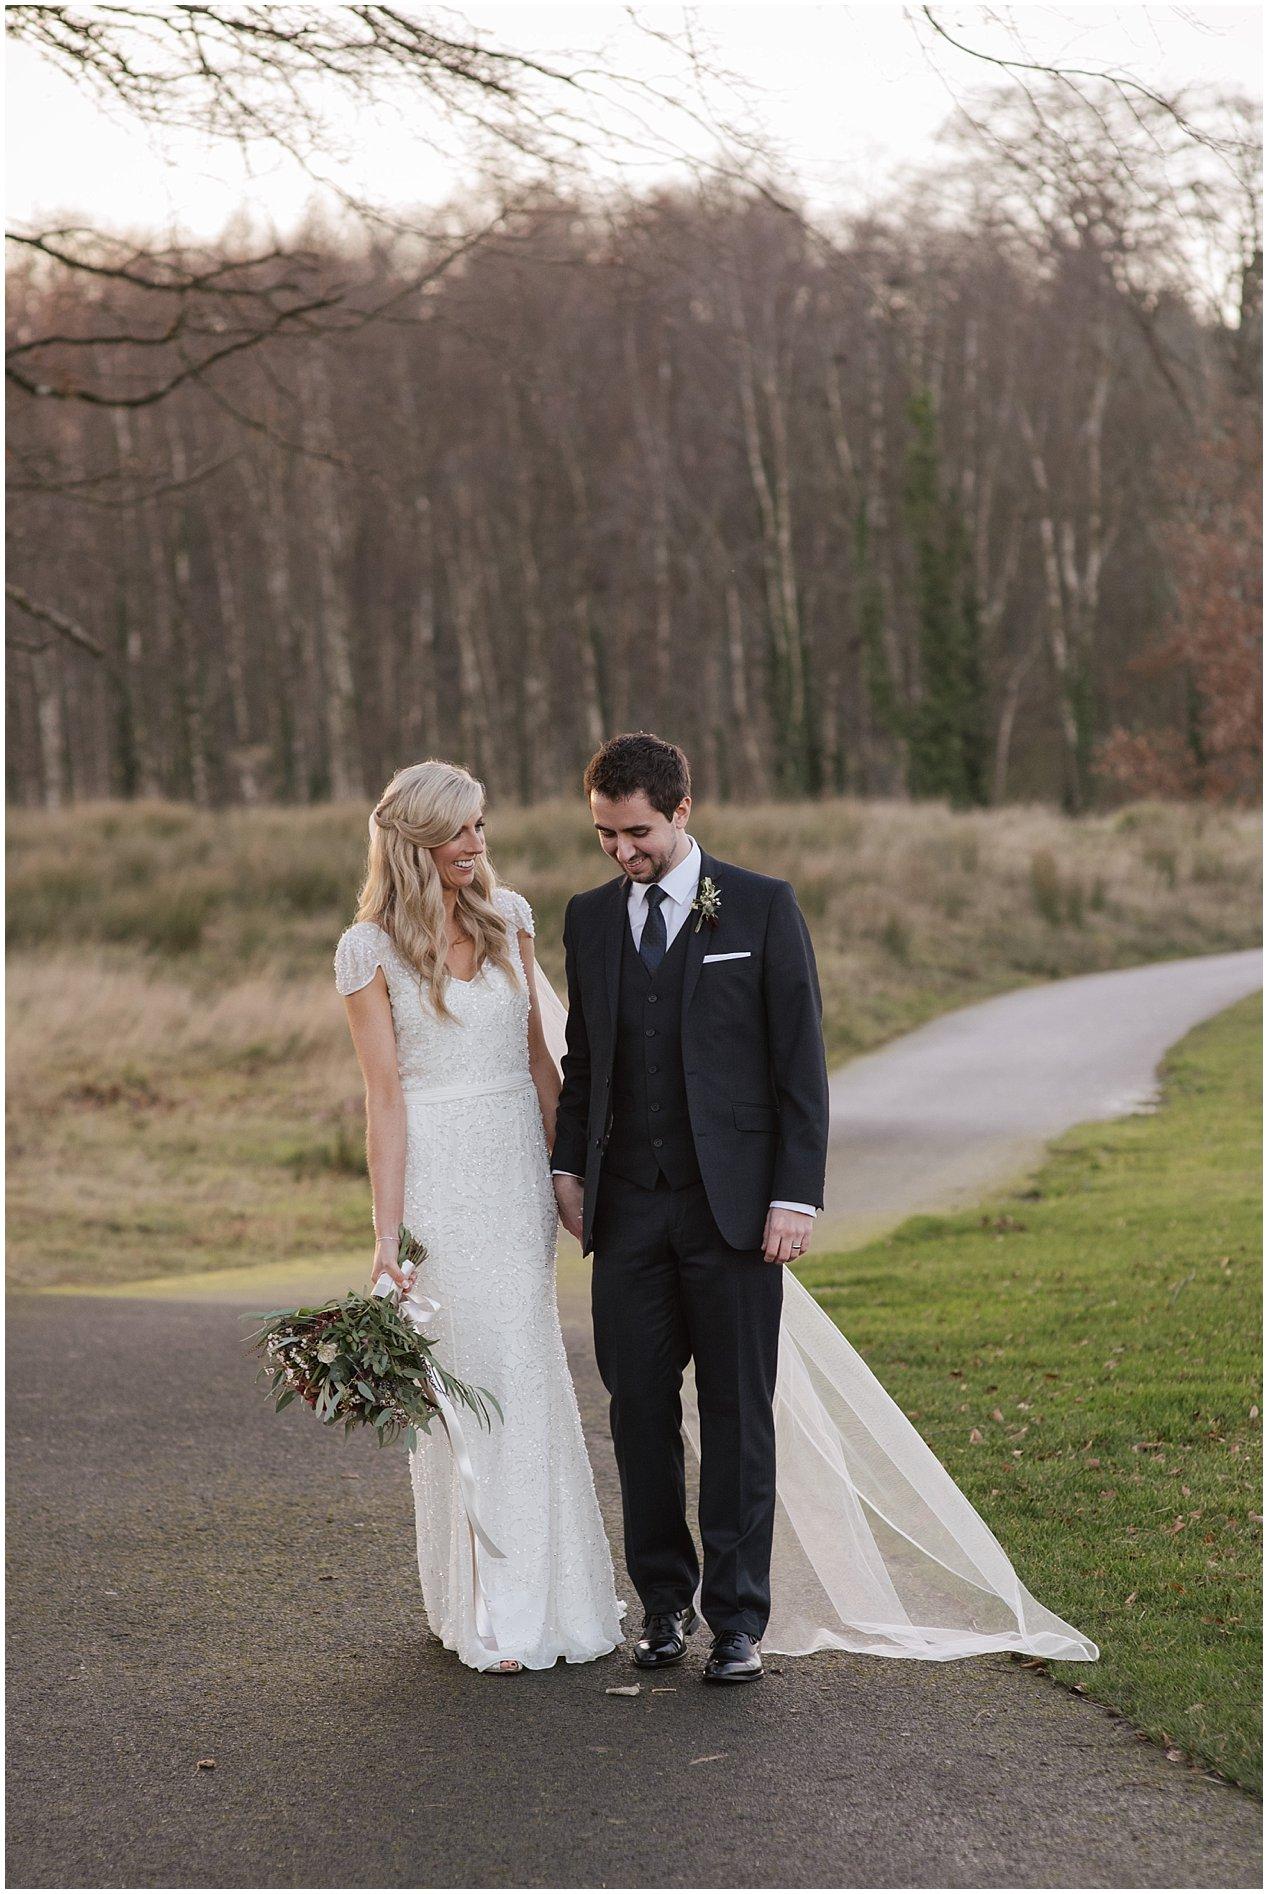 jill_Chris_Lough_Erne_Resort_Wedding_0140.jpg